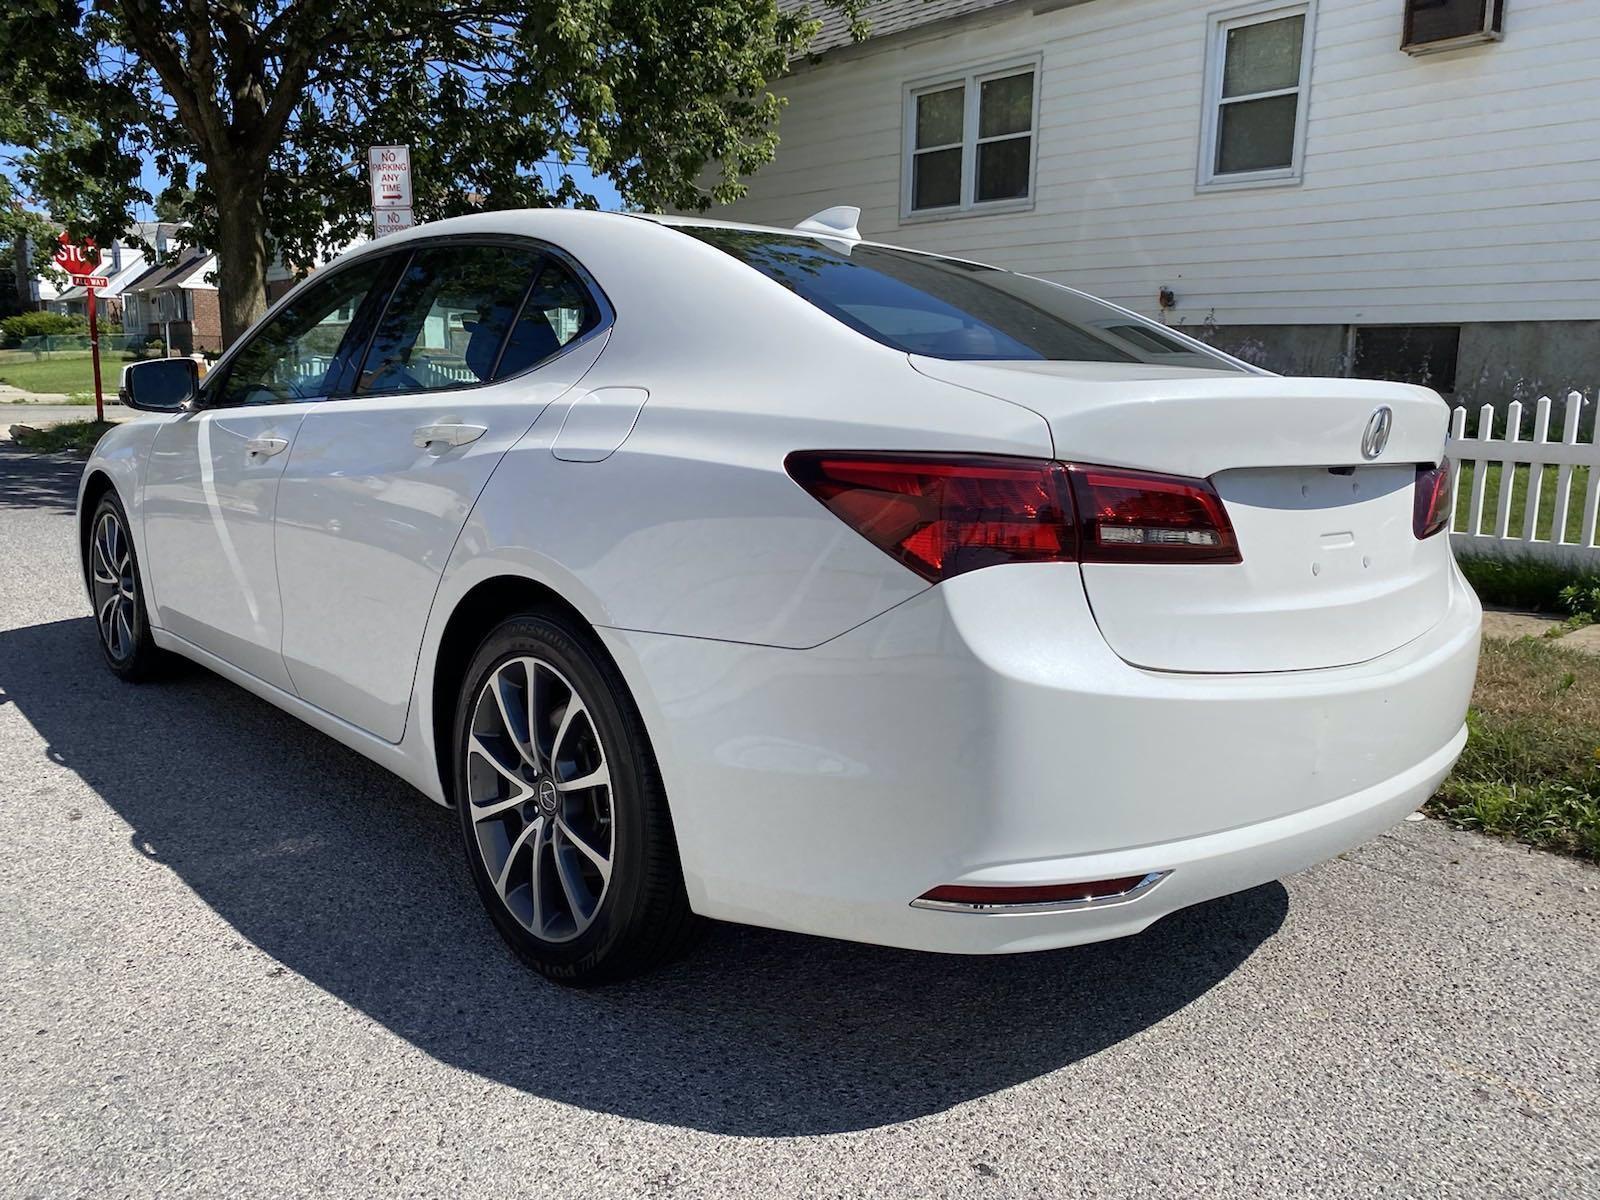 Used-2017-Acura-TLX-V6-w/Technology-Pkg